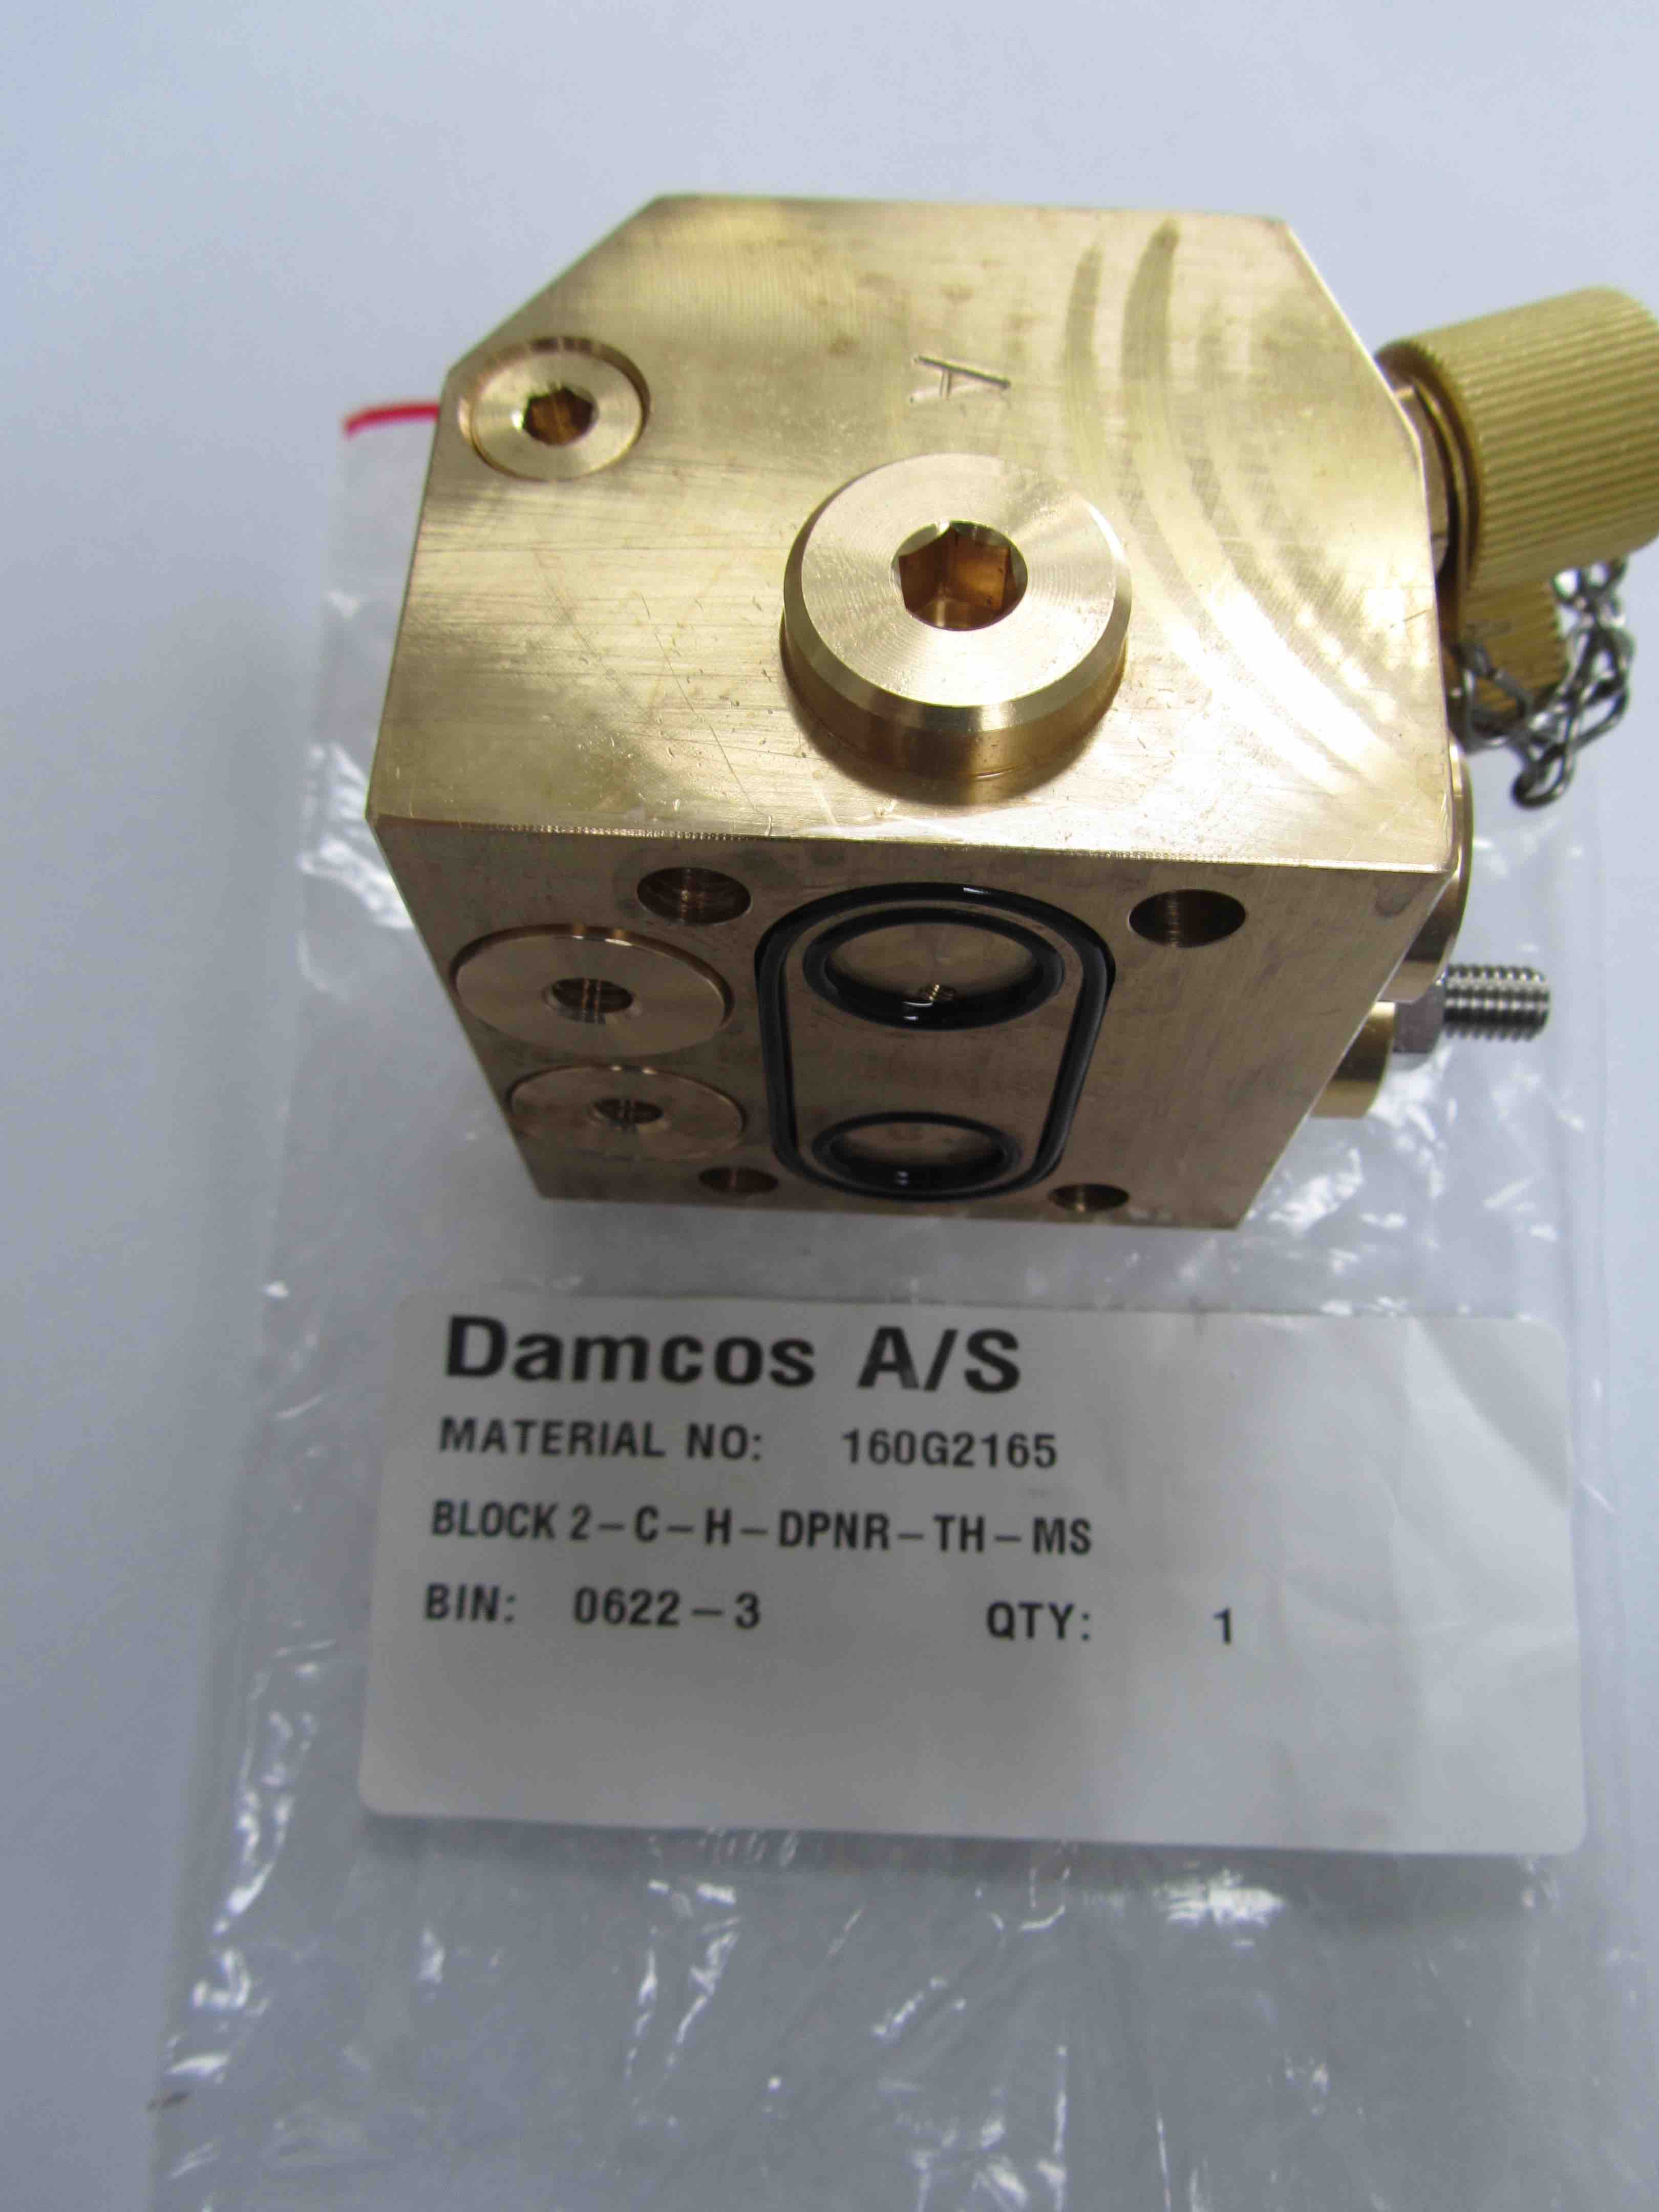 Damcos 2-C-H-DPNR-TH-MS Image